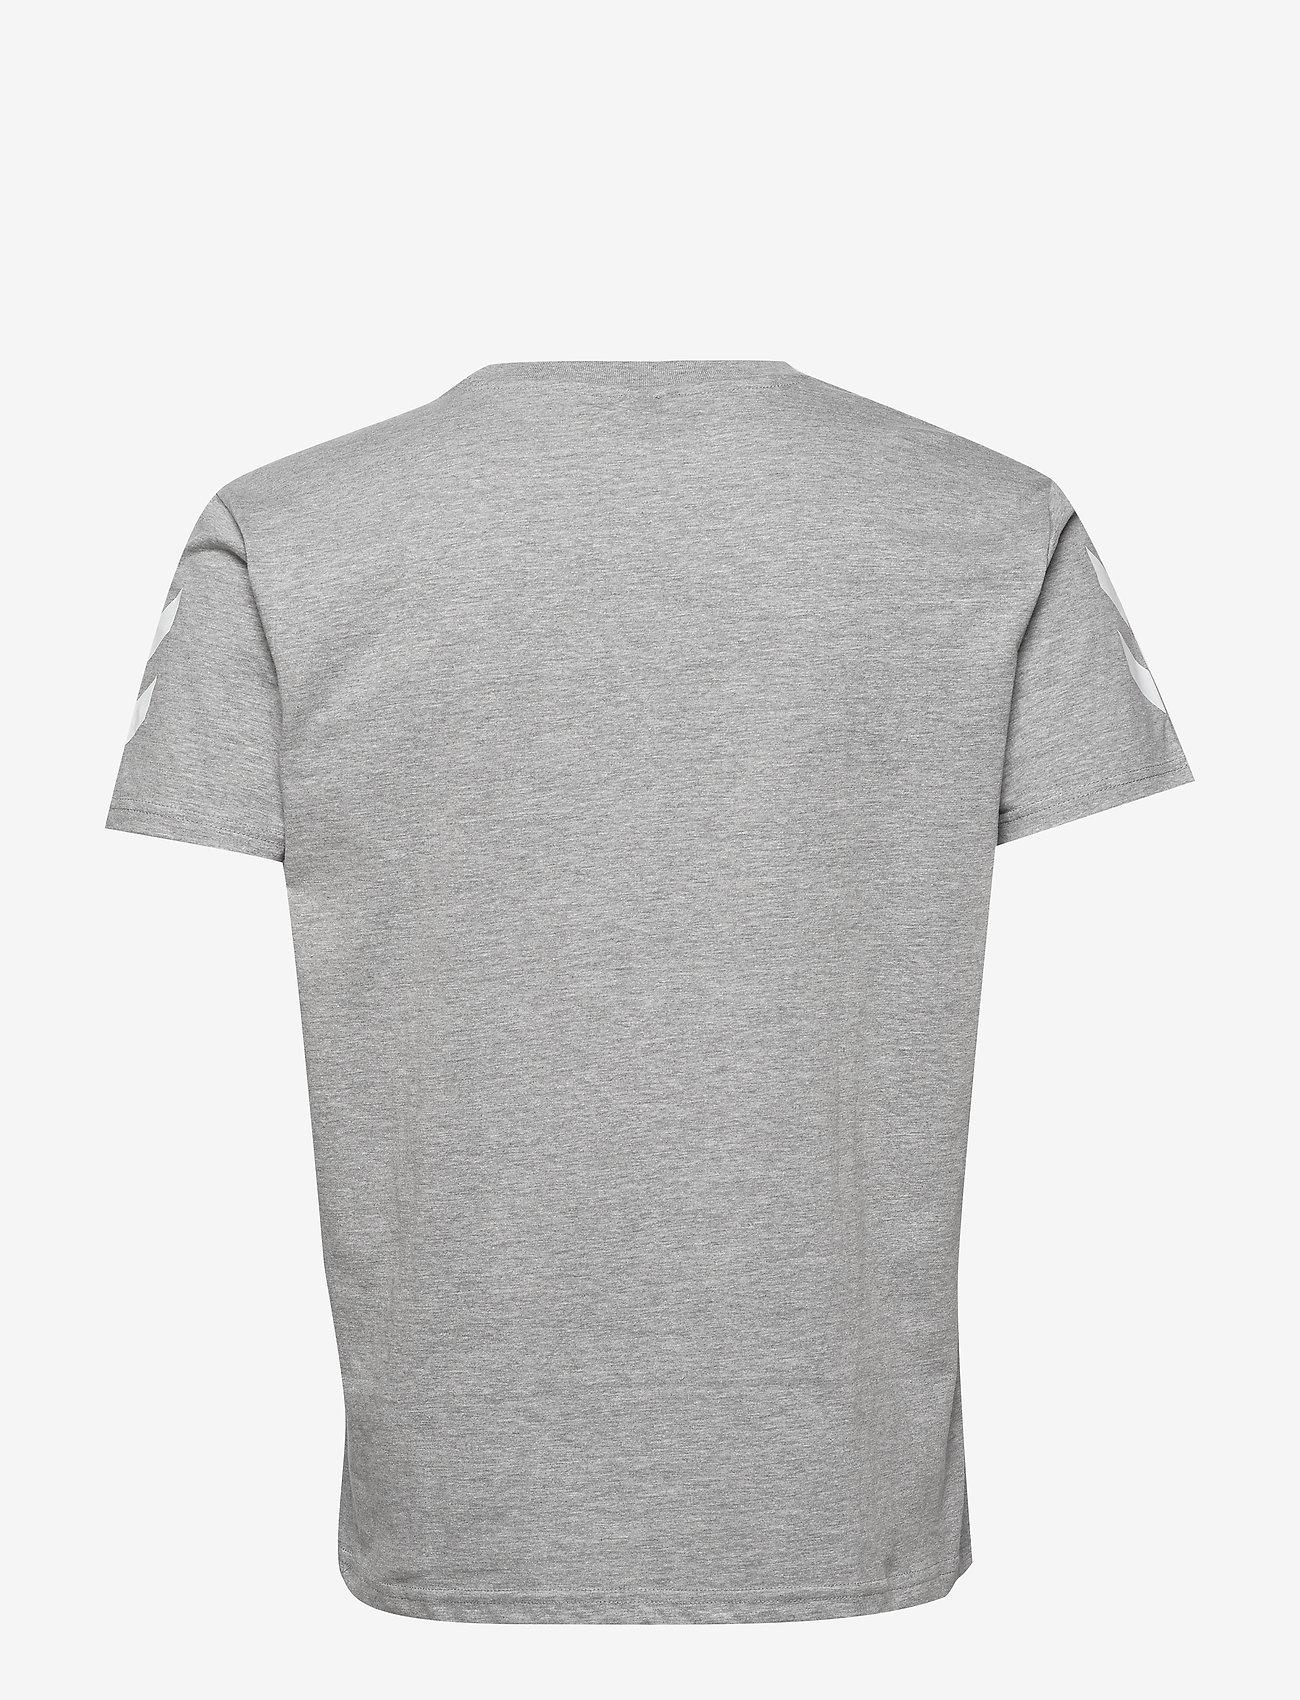 Hmlgo Cotton T-shirt S/s (Grey Melange) (11.96 €) - Hummel duBam